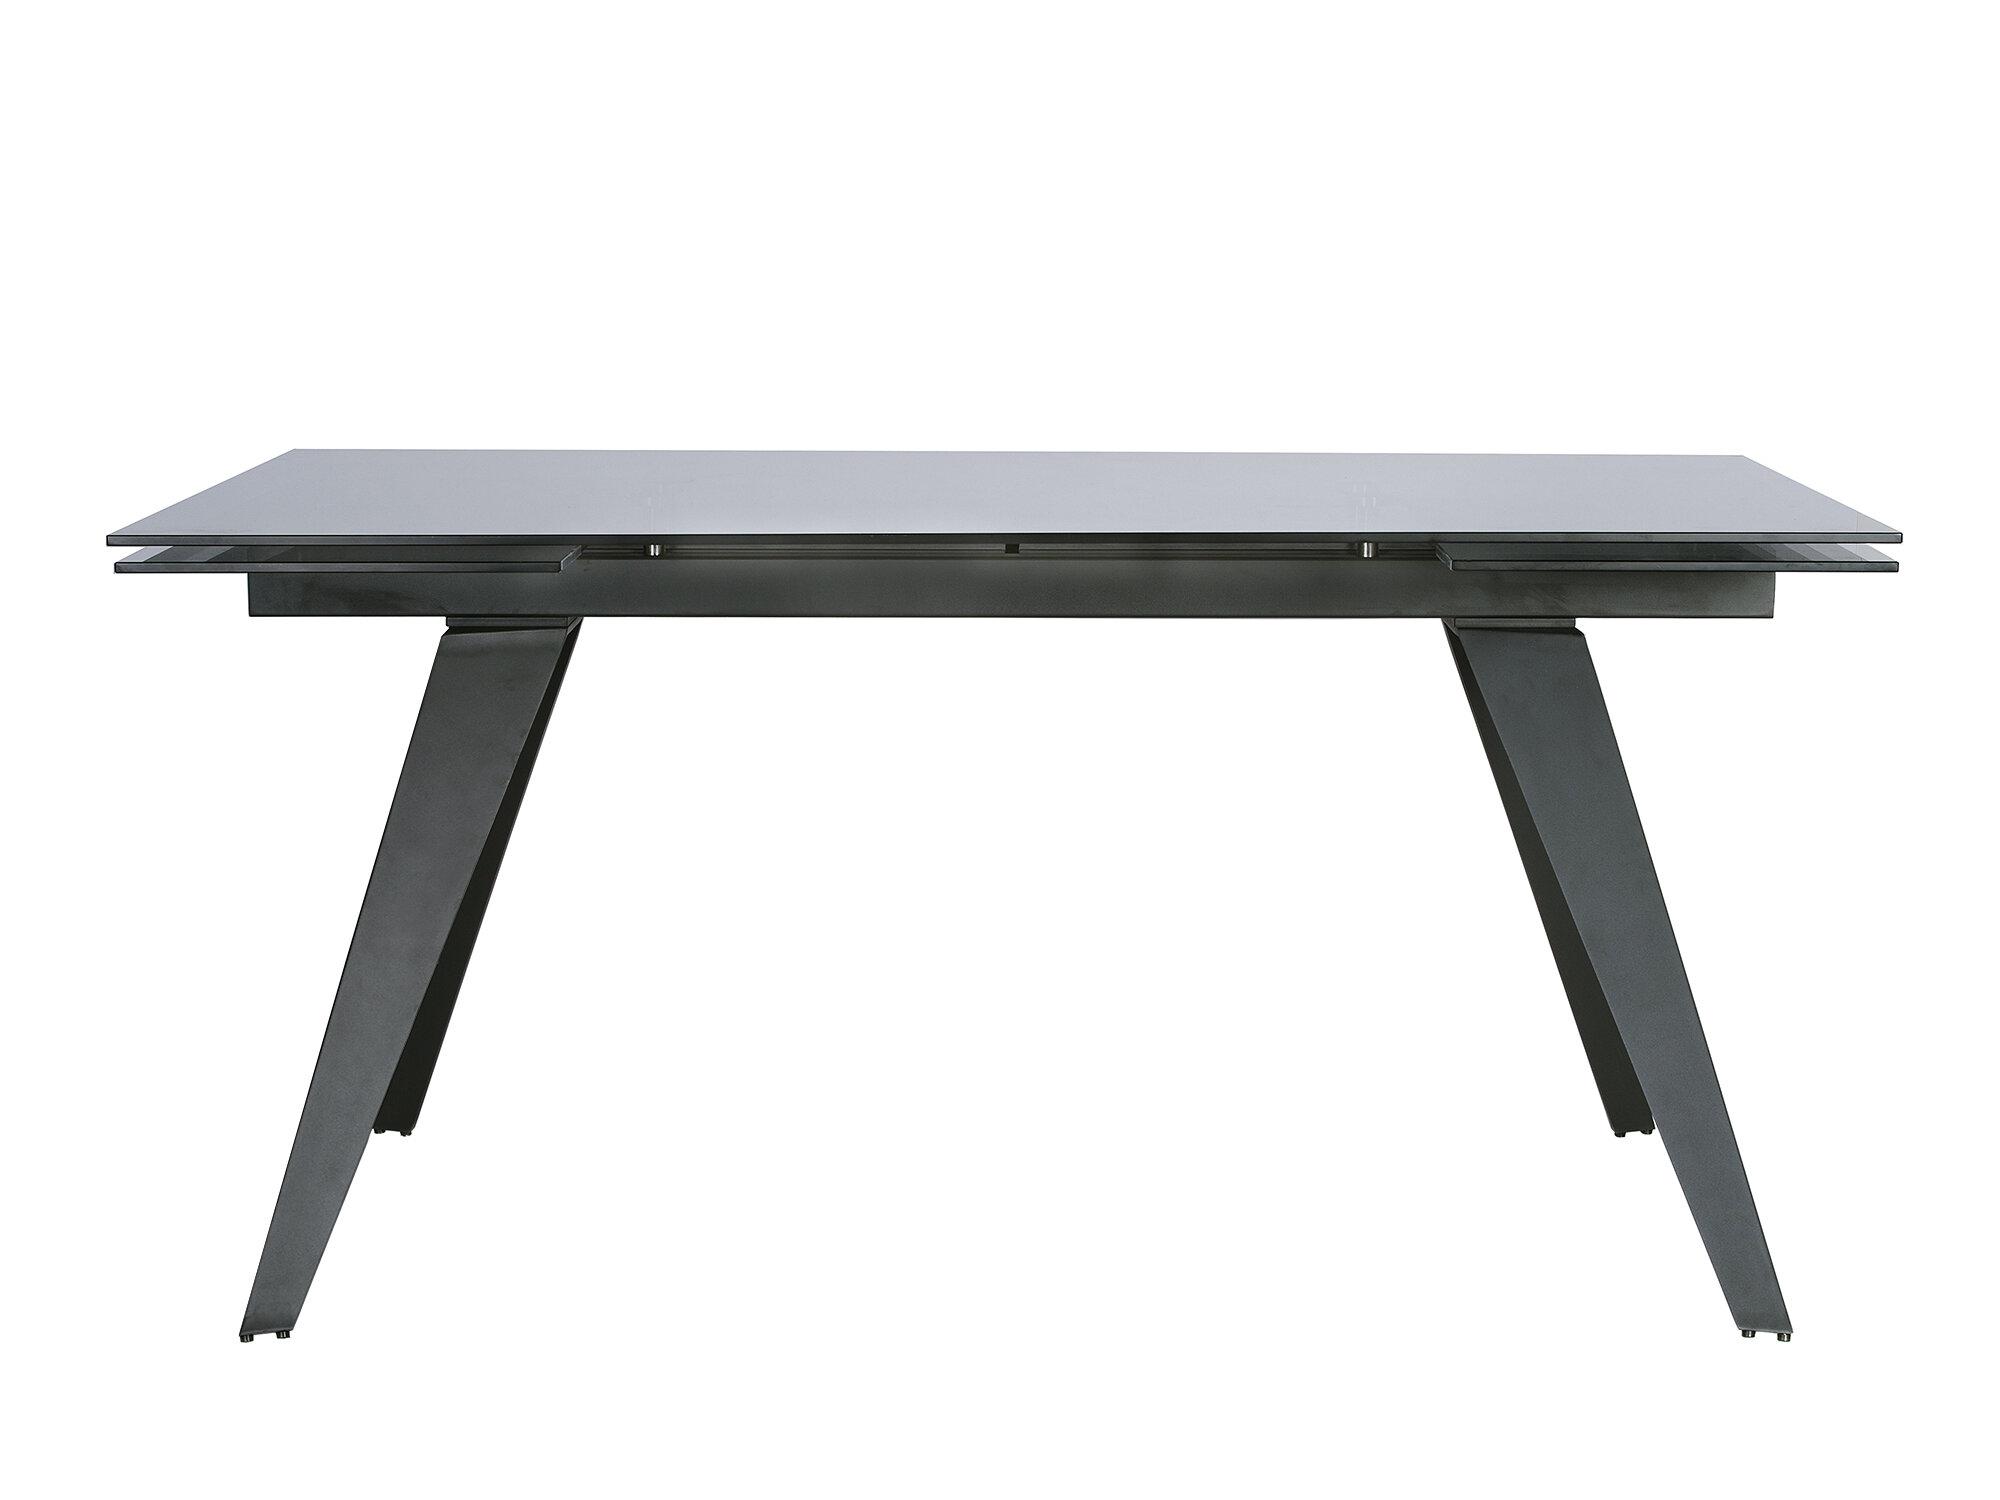 Drop Leaf Brayden Studio Kitchen Dining Tables You Ll Love In 2021 Wayfair